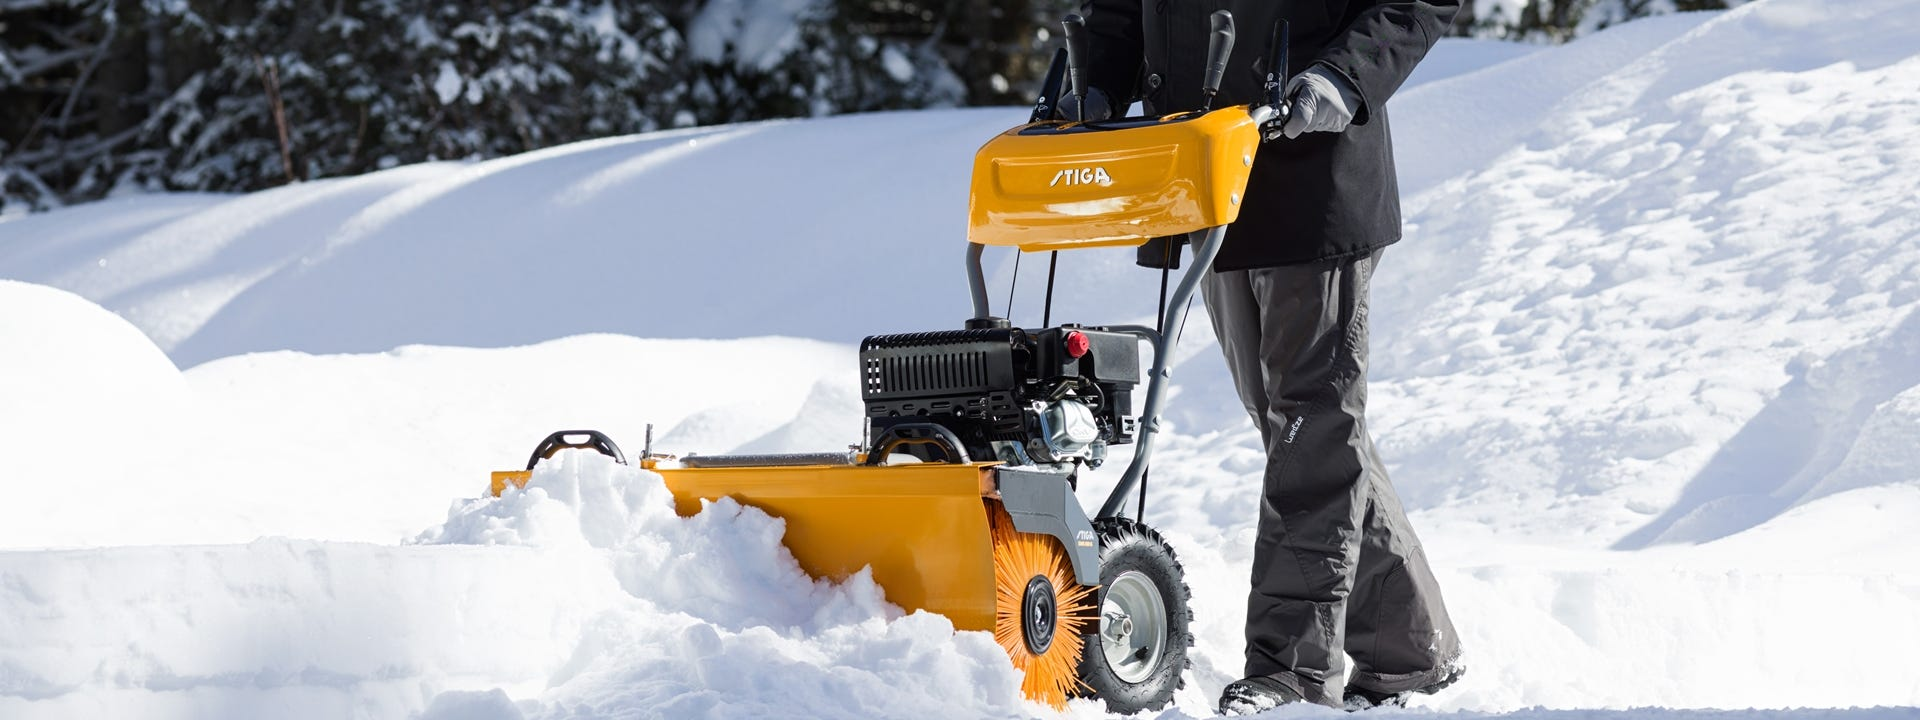 stiga-balayeuse-thermique-accessoires-neige